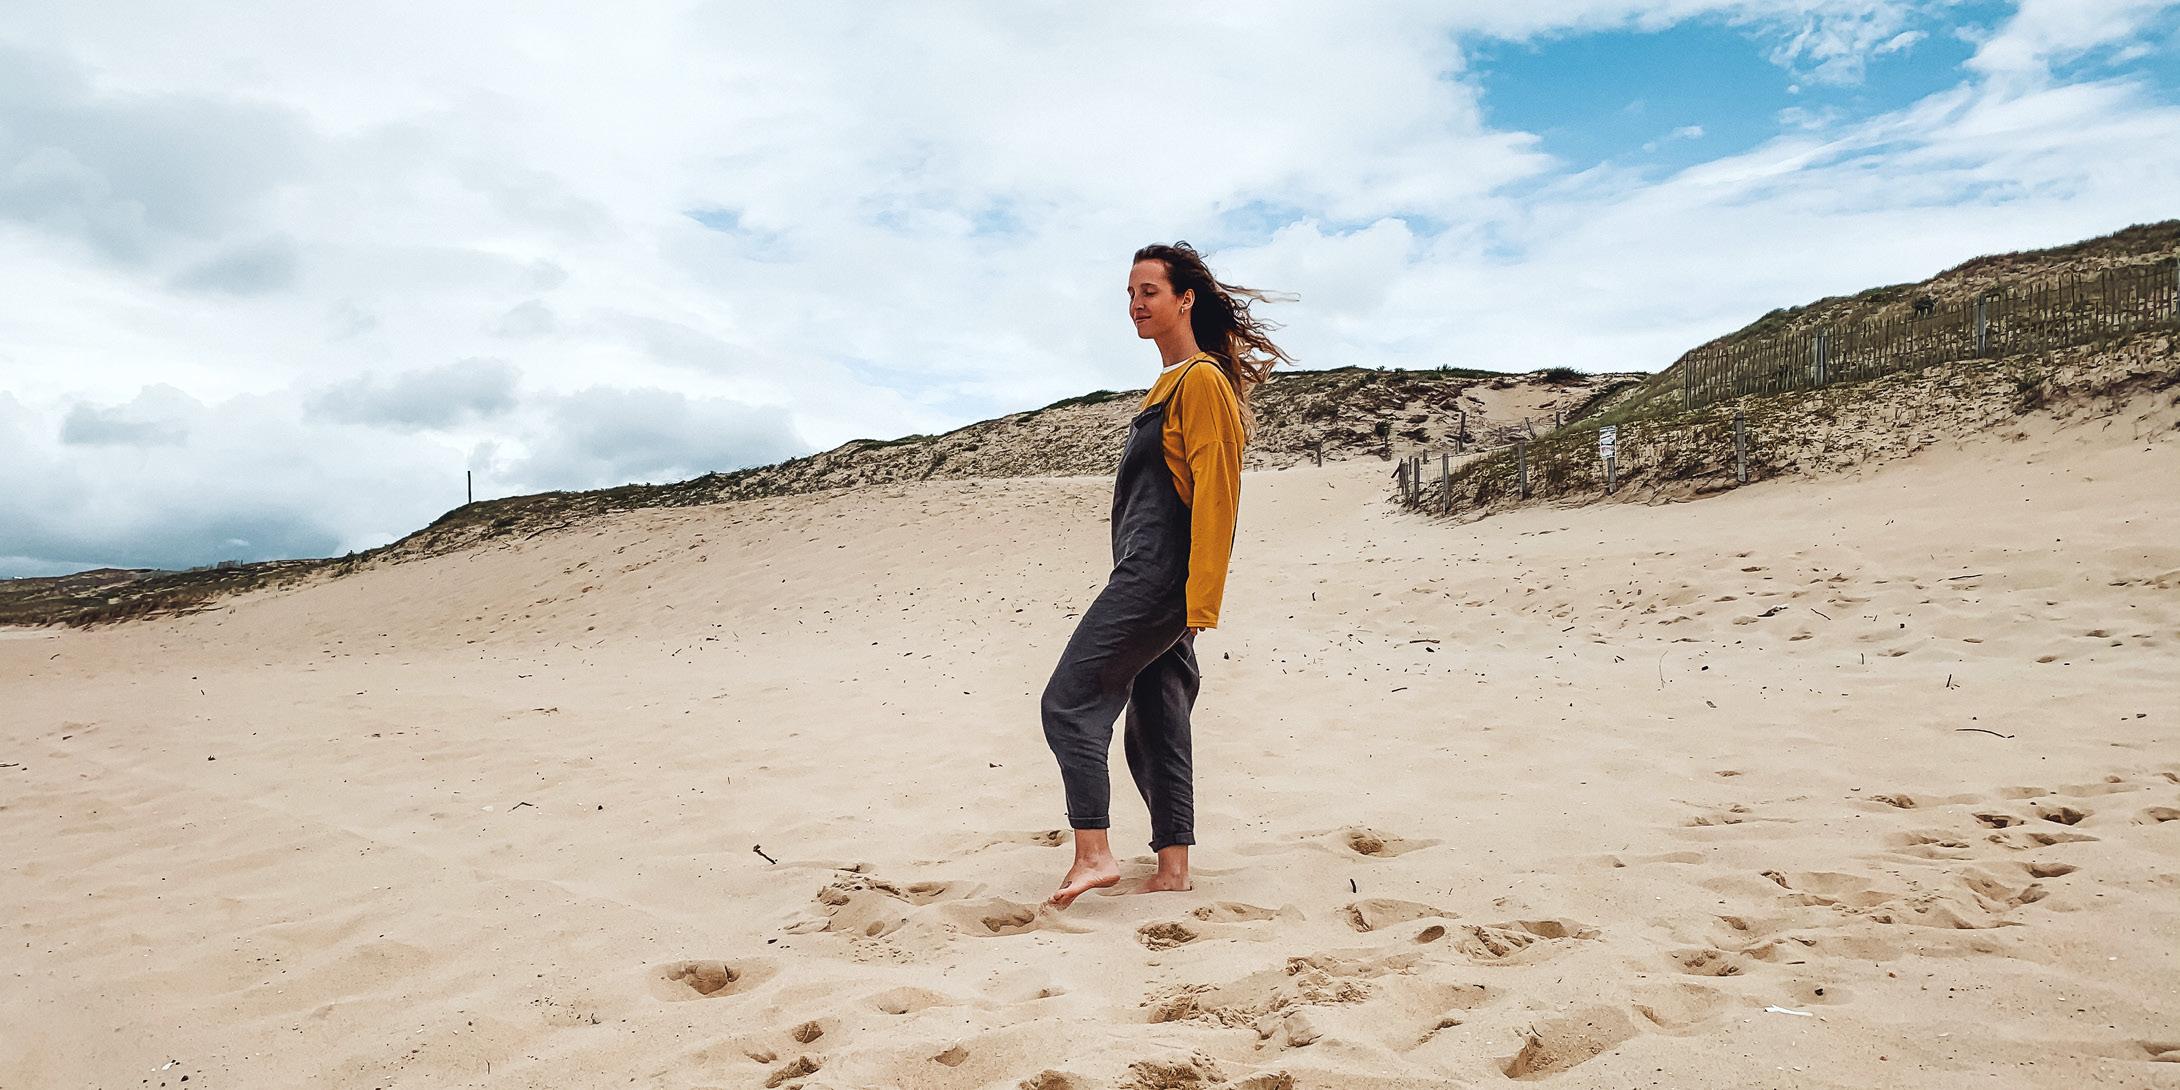 CALI JUMPSUIT LONG SOIL BEACH